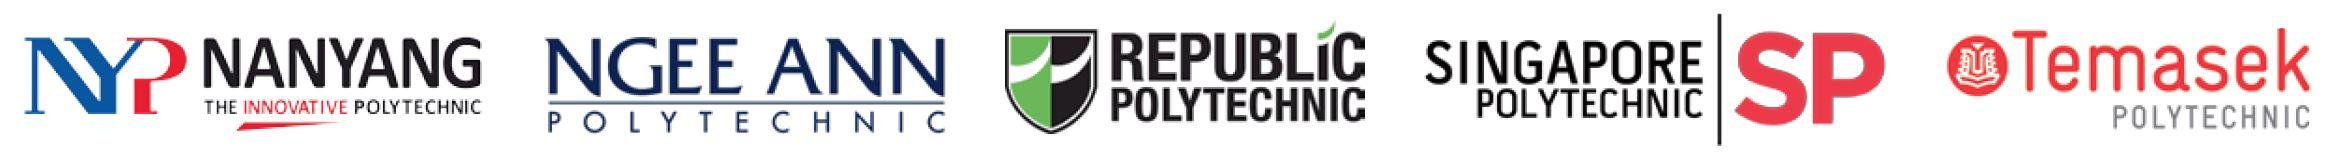 Poly_logos.JPG